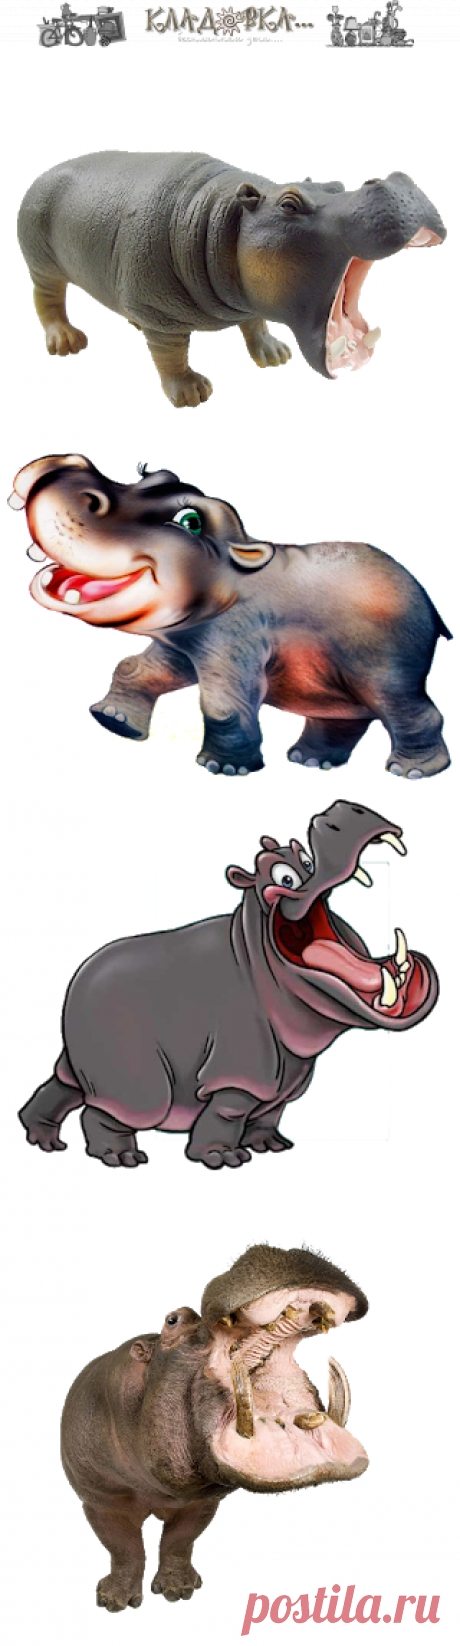 Кладовка...: Бегемоты -на прозрачном фоне